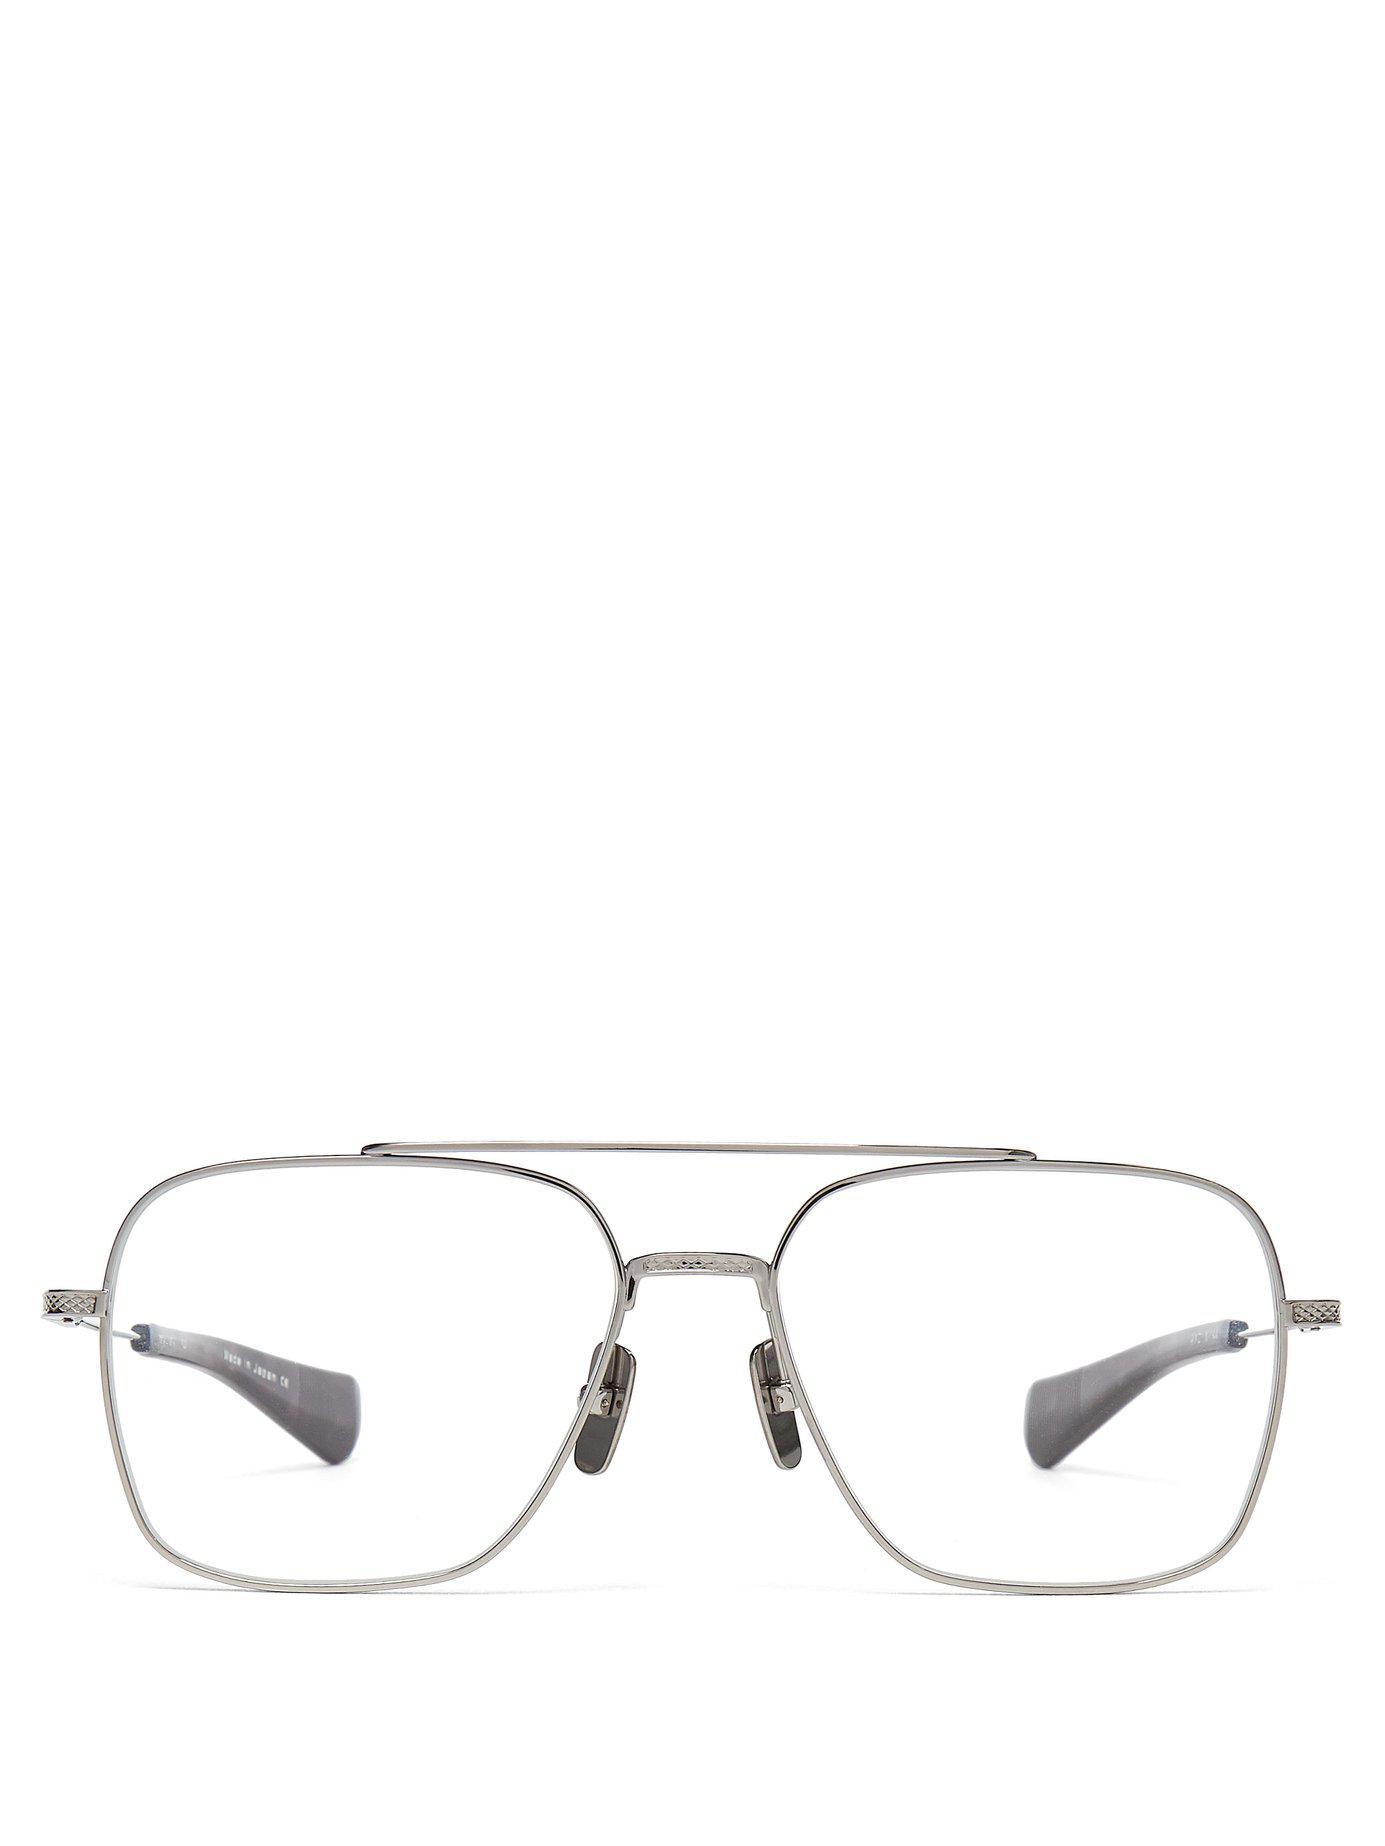 38dbeea8e68 Dita Eyewear. Men s Metallic Flight Seven Aviator Metal Optical Glasses